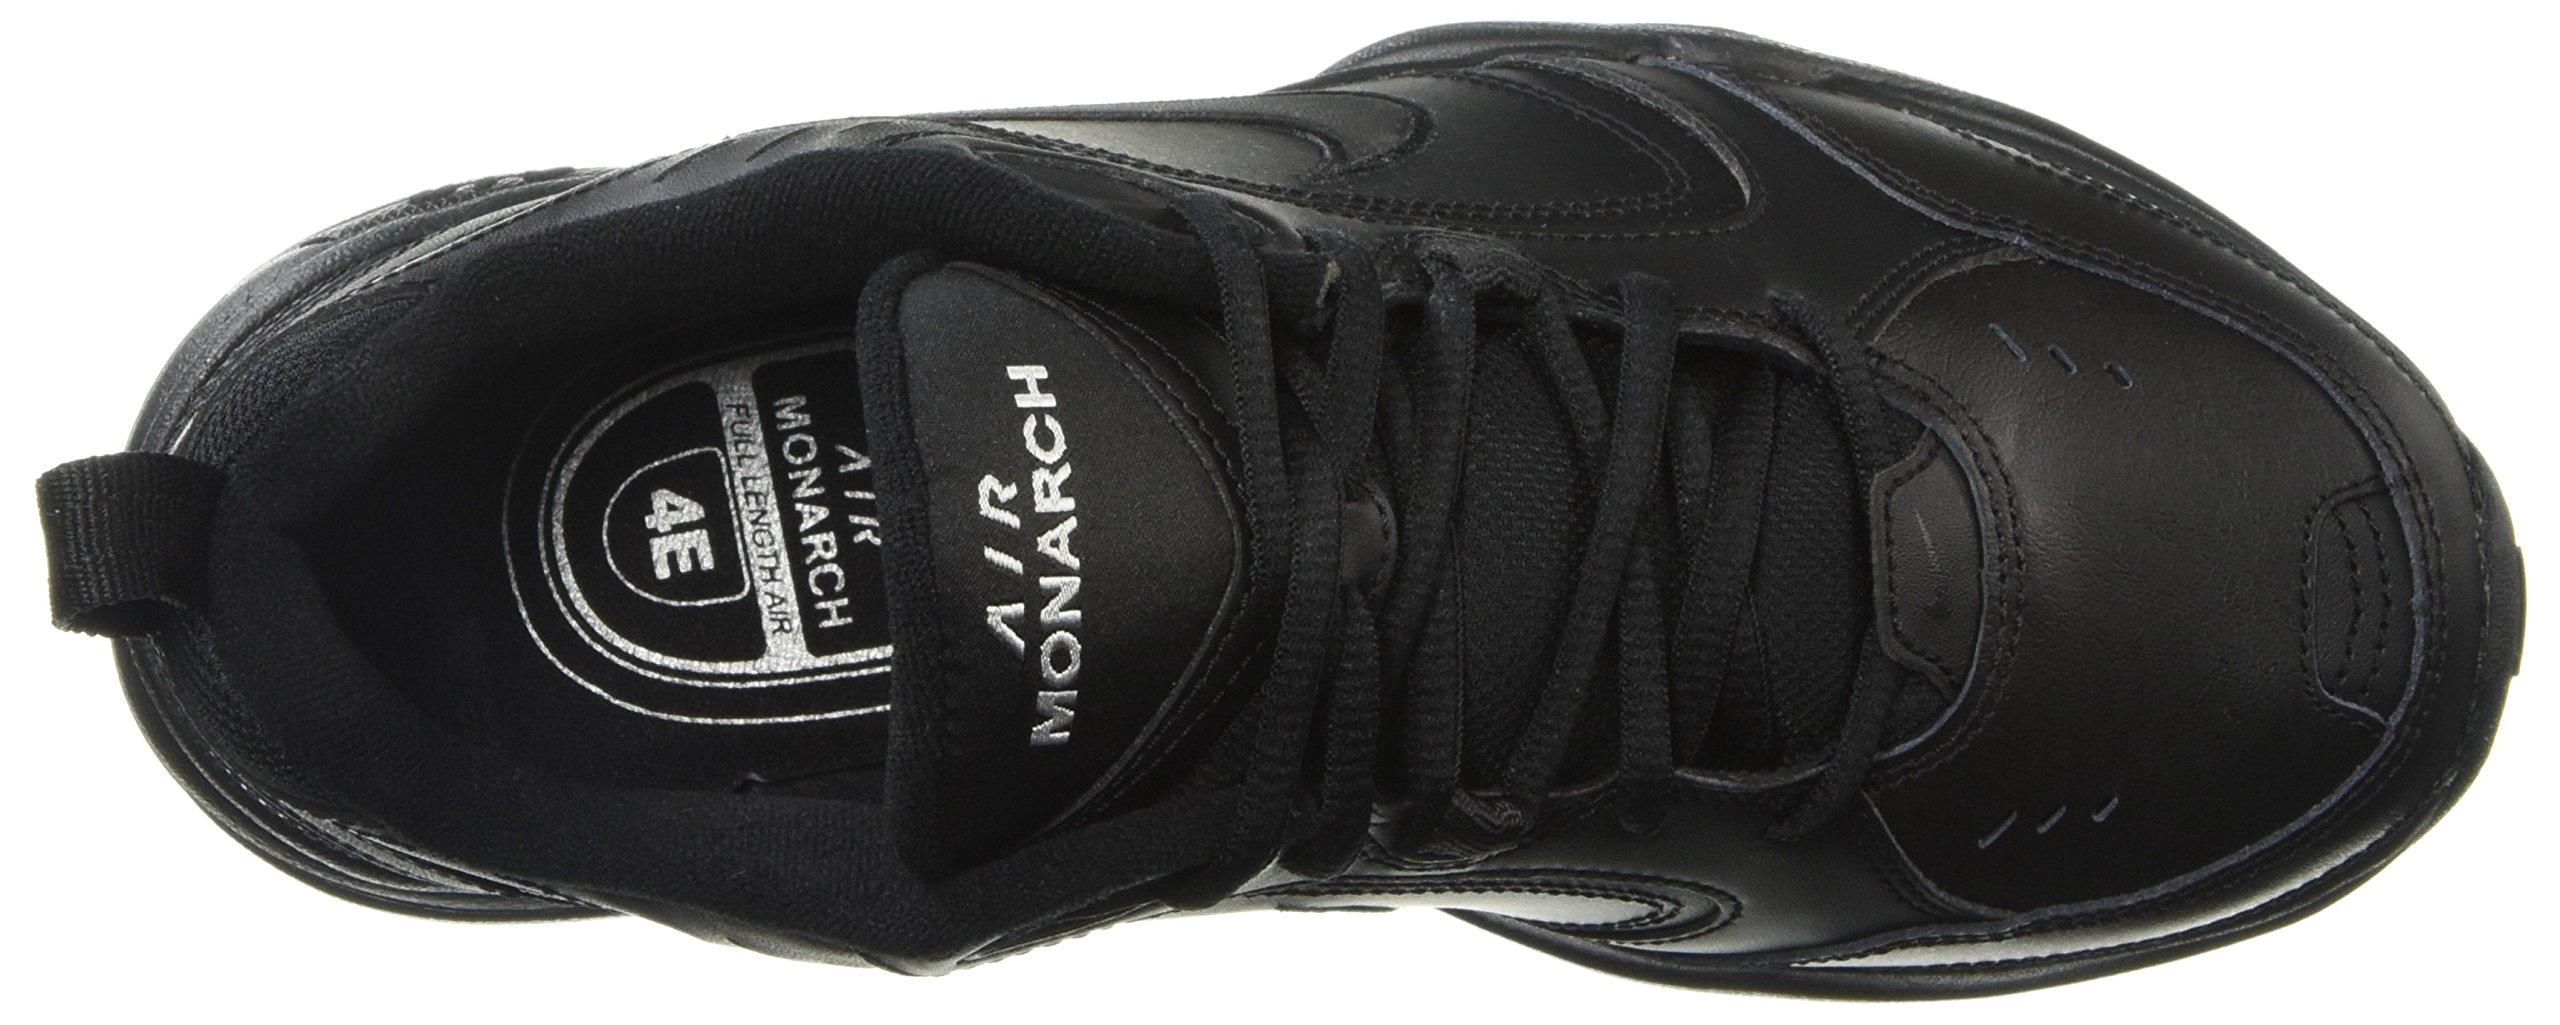 Nike-Men-039-s-Air-Monarch-IV-Cross-Trainer-Sneaker-416355 thumbnail 6